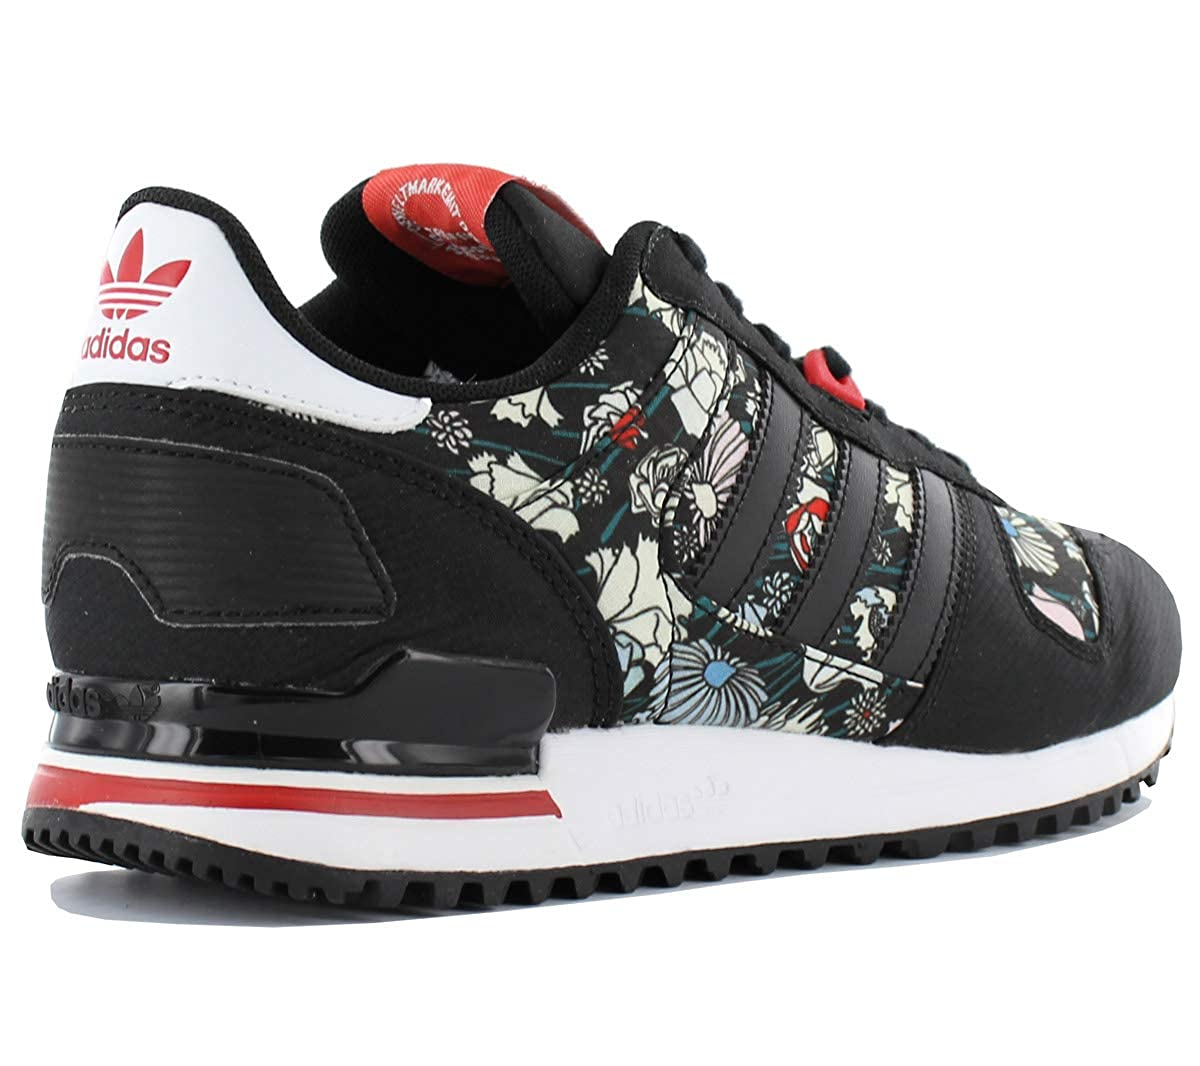 3661138c39e281 adidas Originals ZX 700 W Damen Schuhe Schwarz Blumen Muster Fashion  Sneaker Trend Turnschuhe Sportschuhe  Amazon.de  Schuhe   Handtaschen